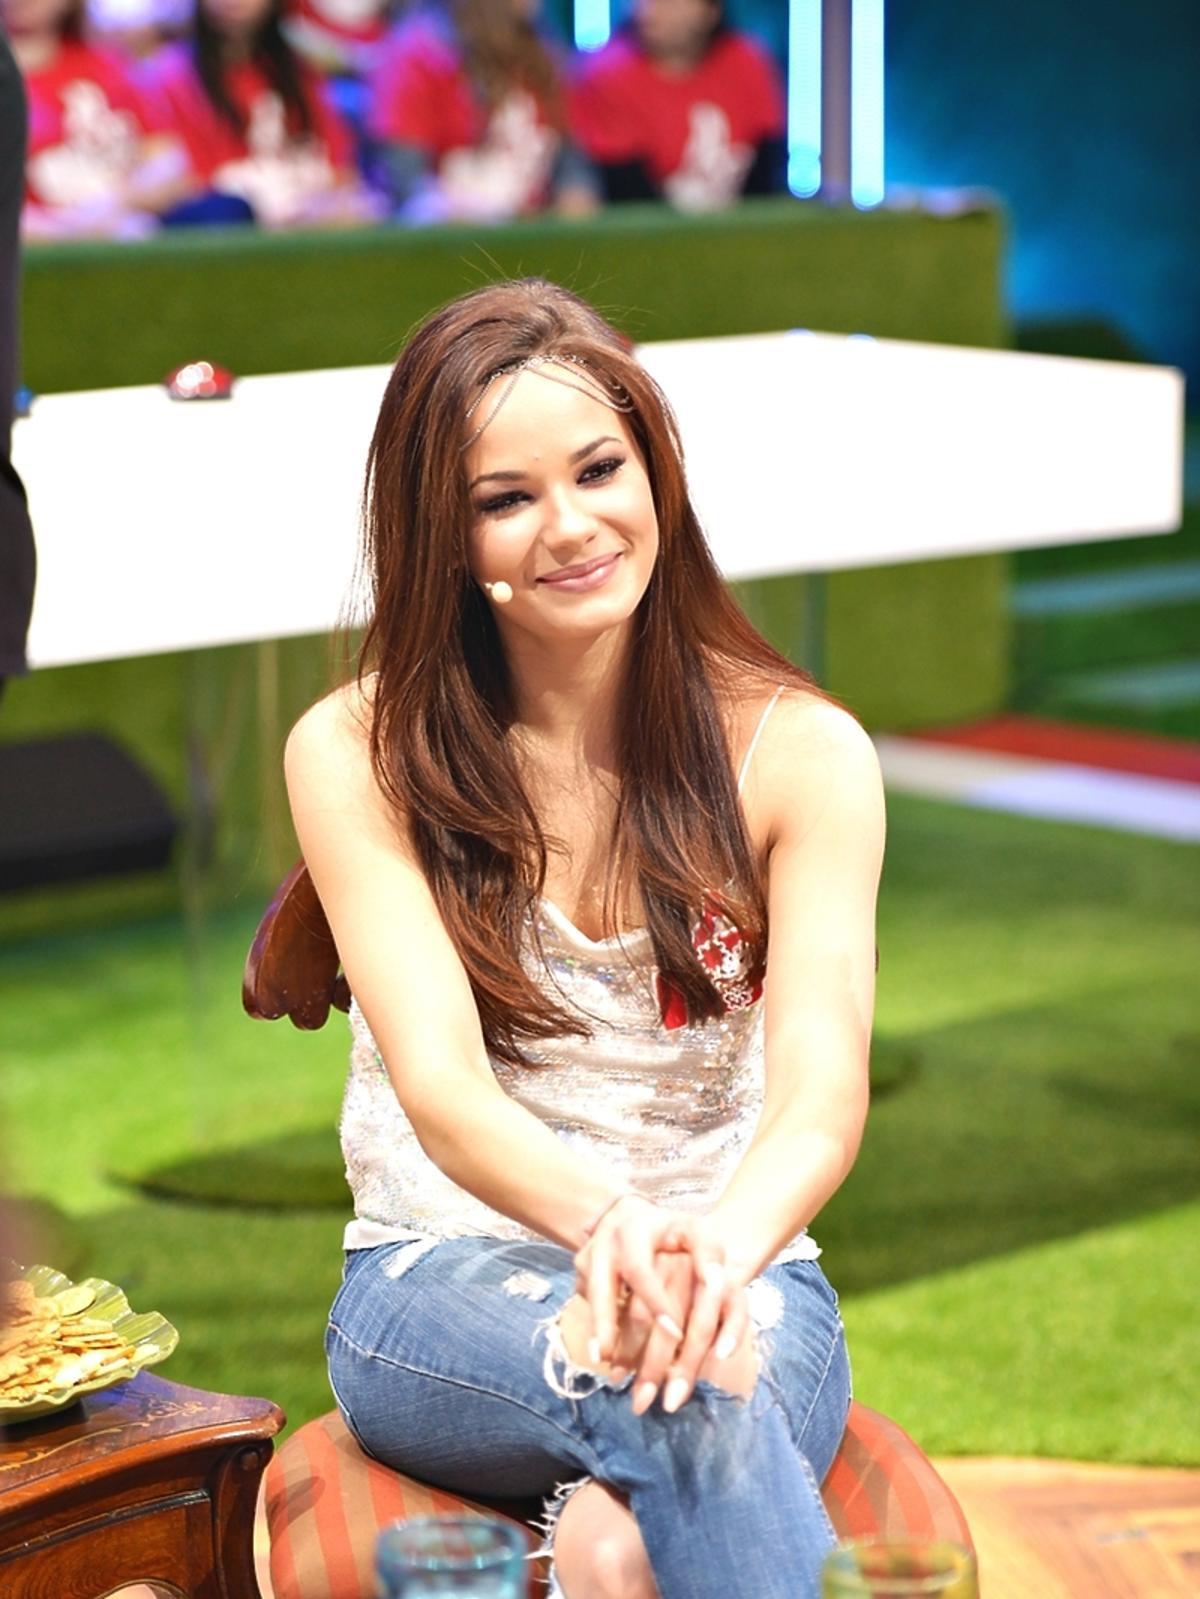 Natalia Szroeder, Kocham Cie Polsko